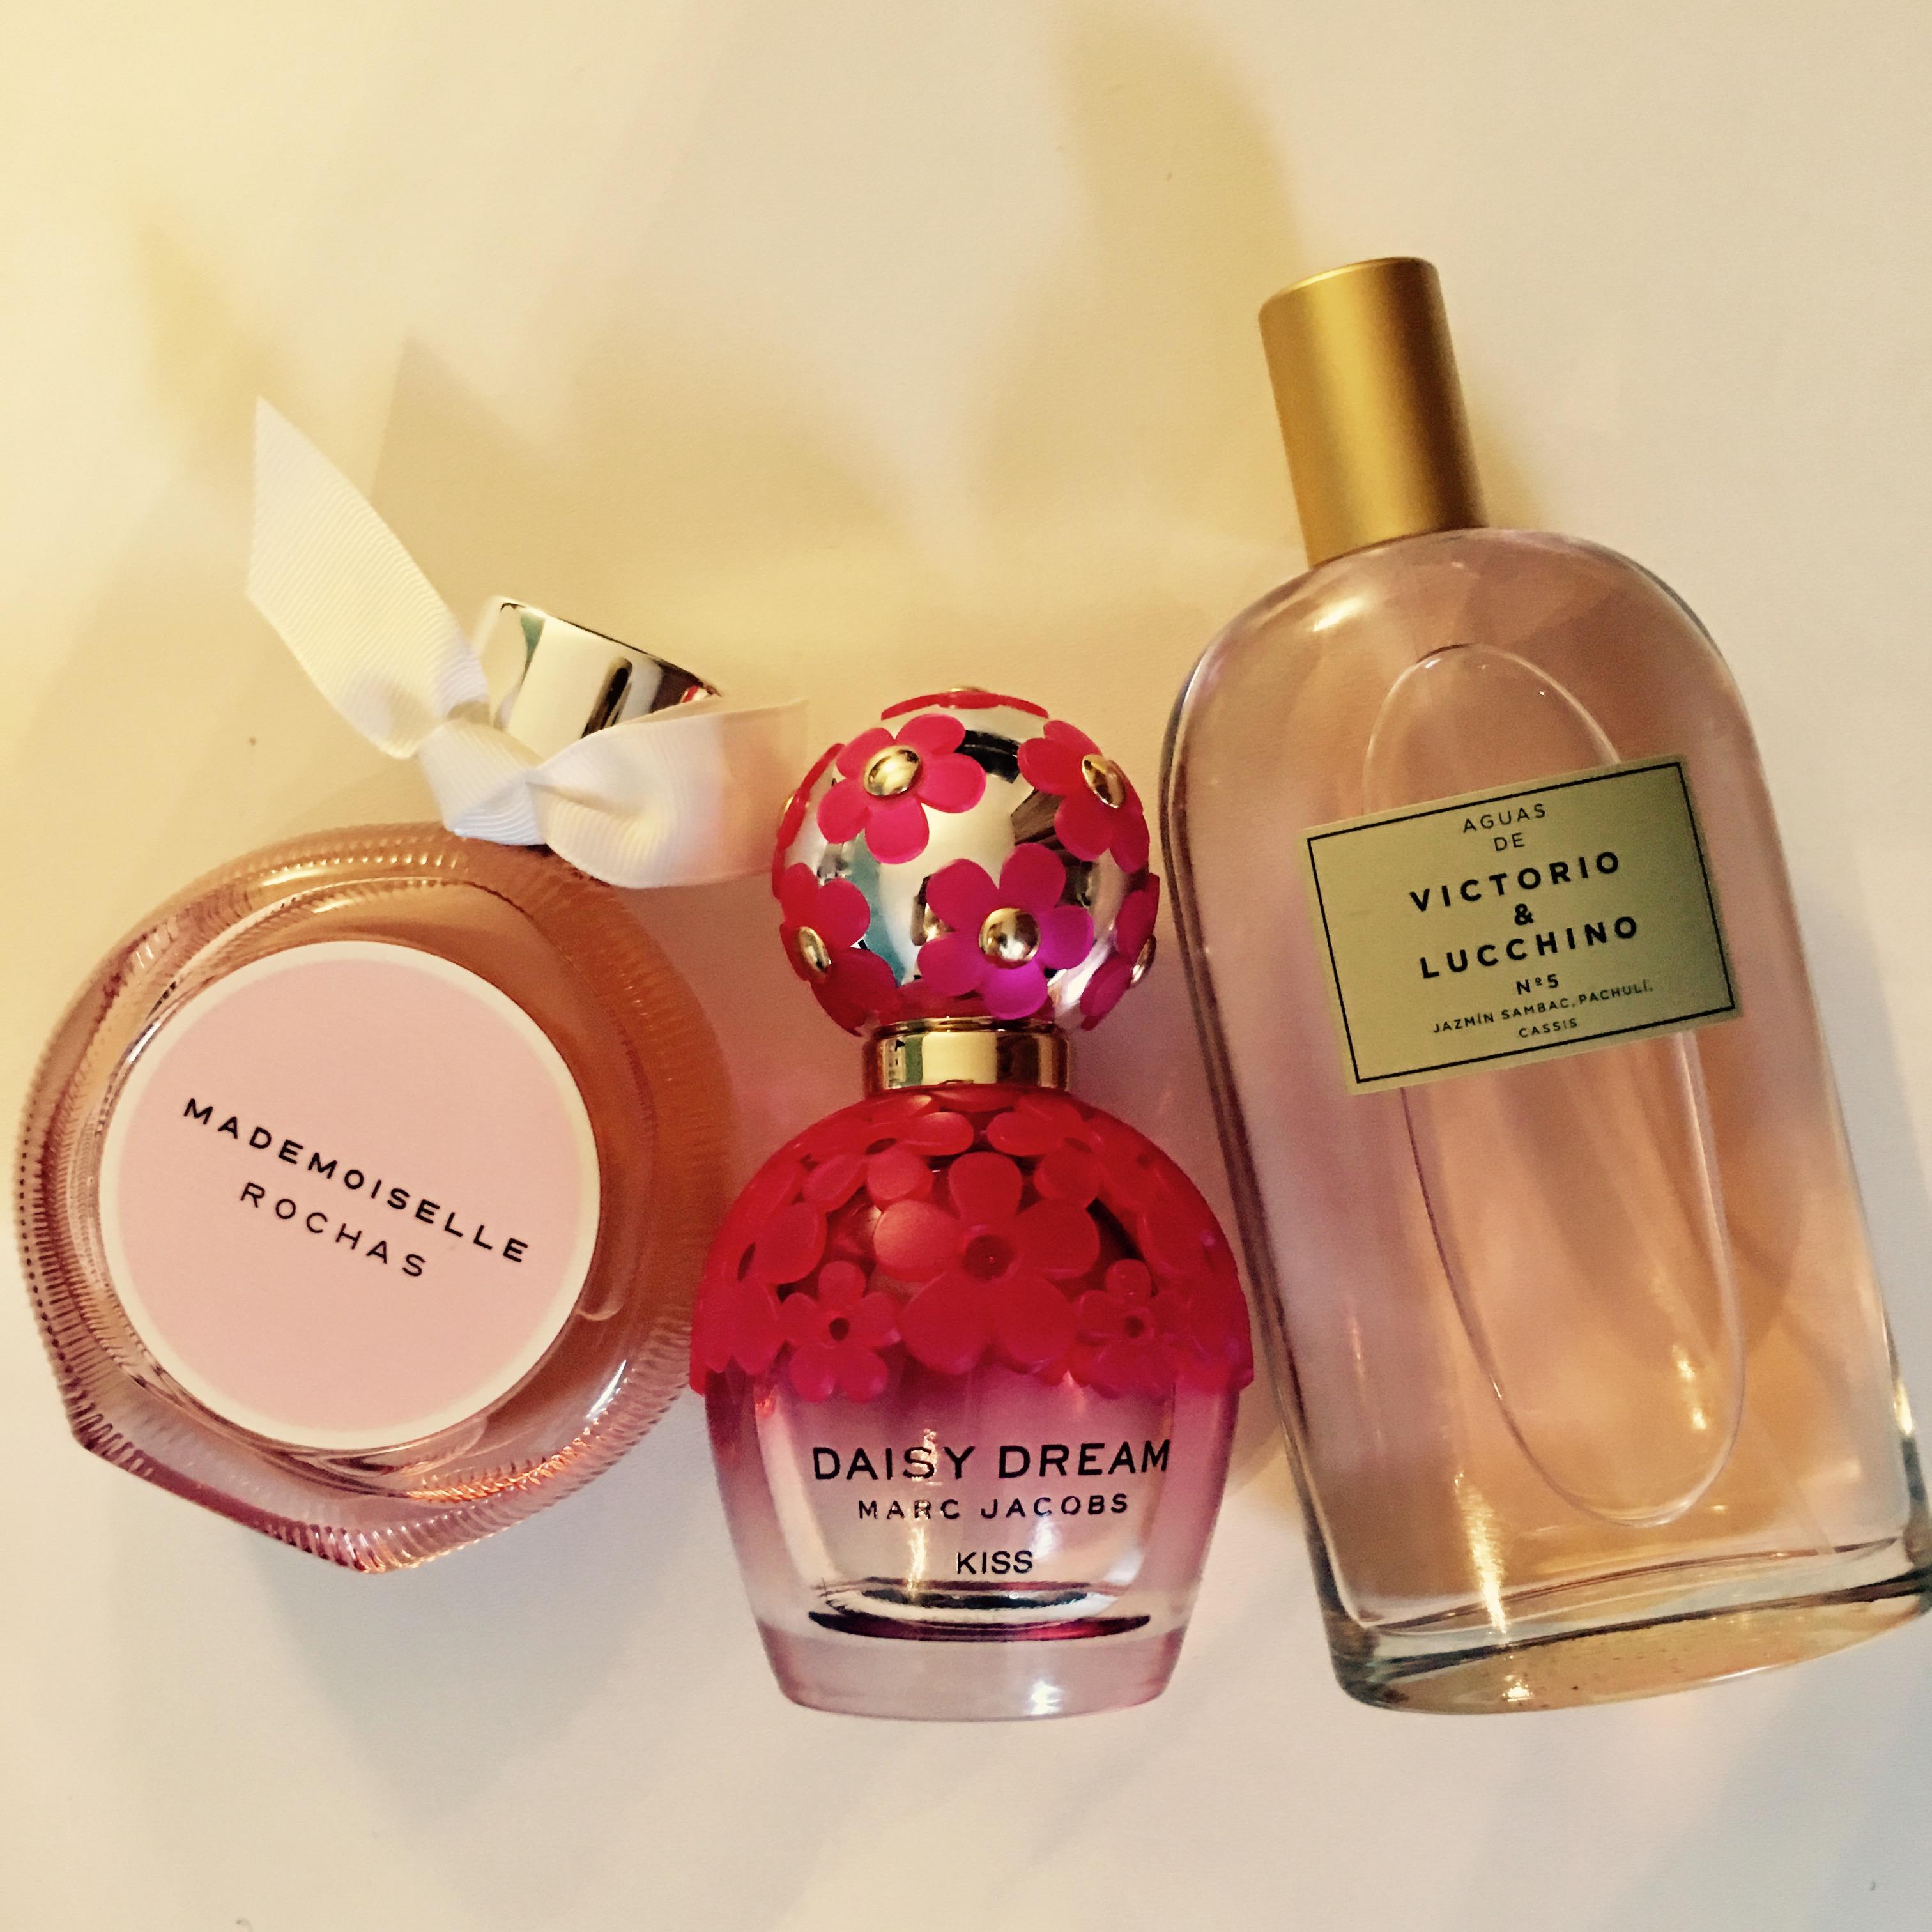 Mes parfums fruités du moment-MademoiselleRochas;DaisyKiss;Victorio_Lucchino